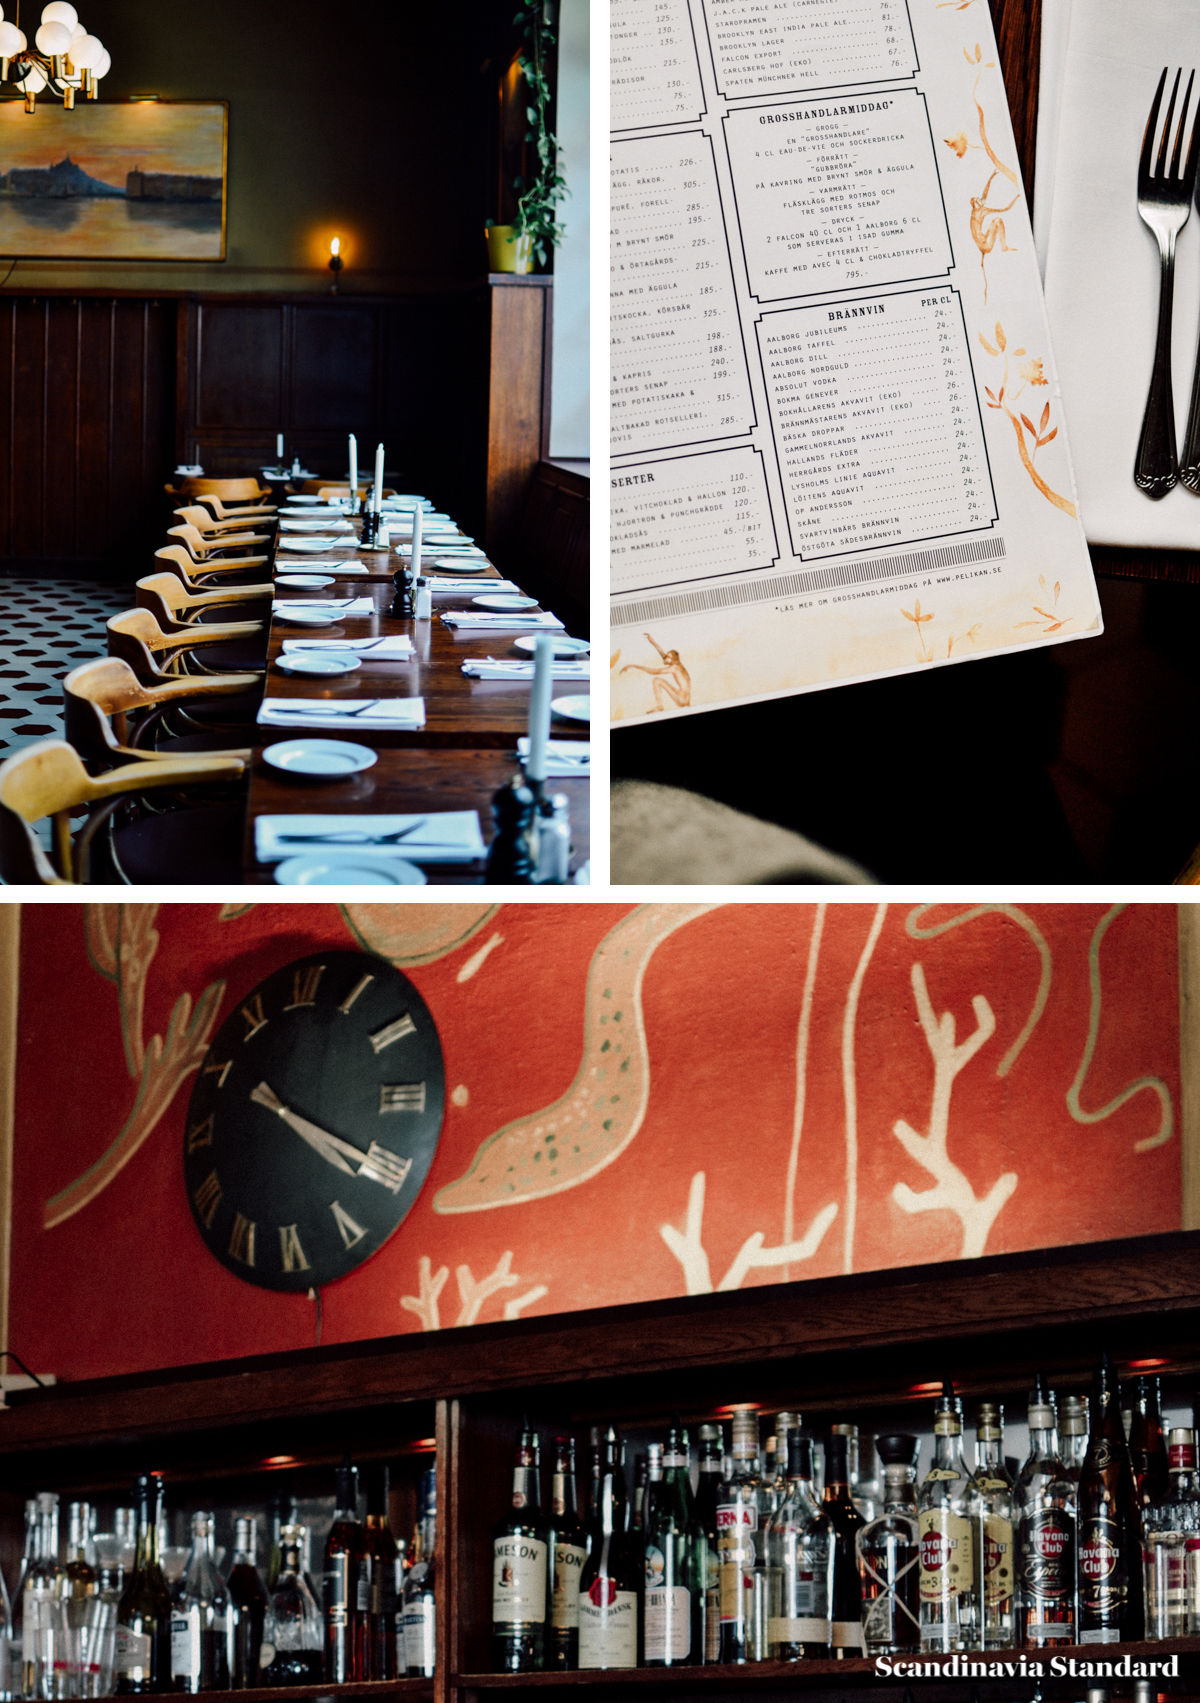 Knausgard Eating in Stockholm - Pelikan Collage I Scandinavia Standard